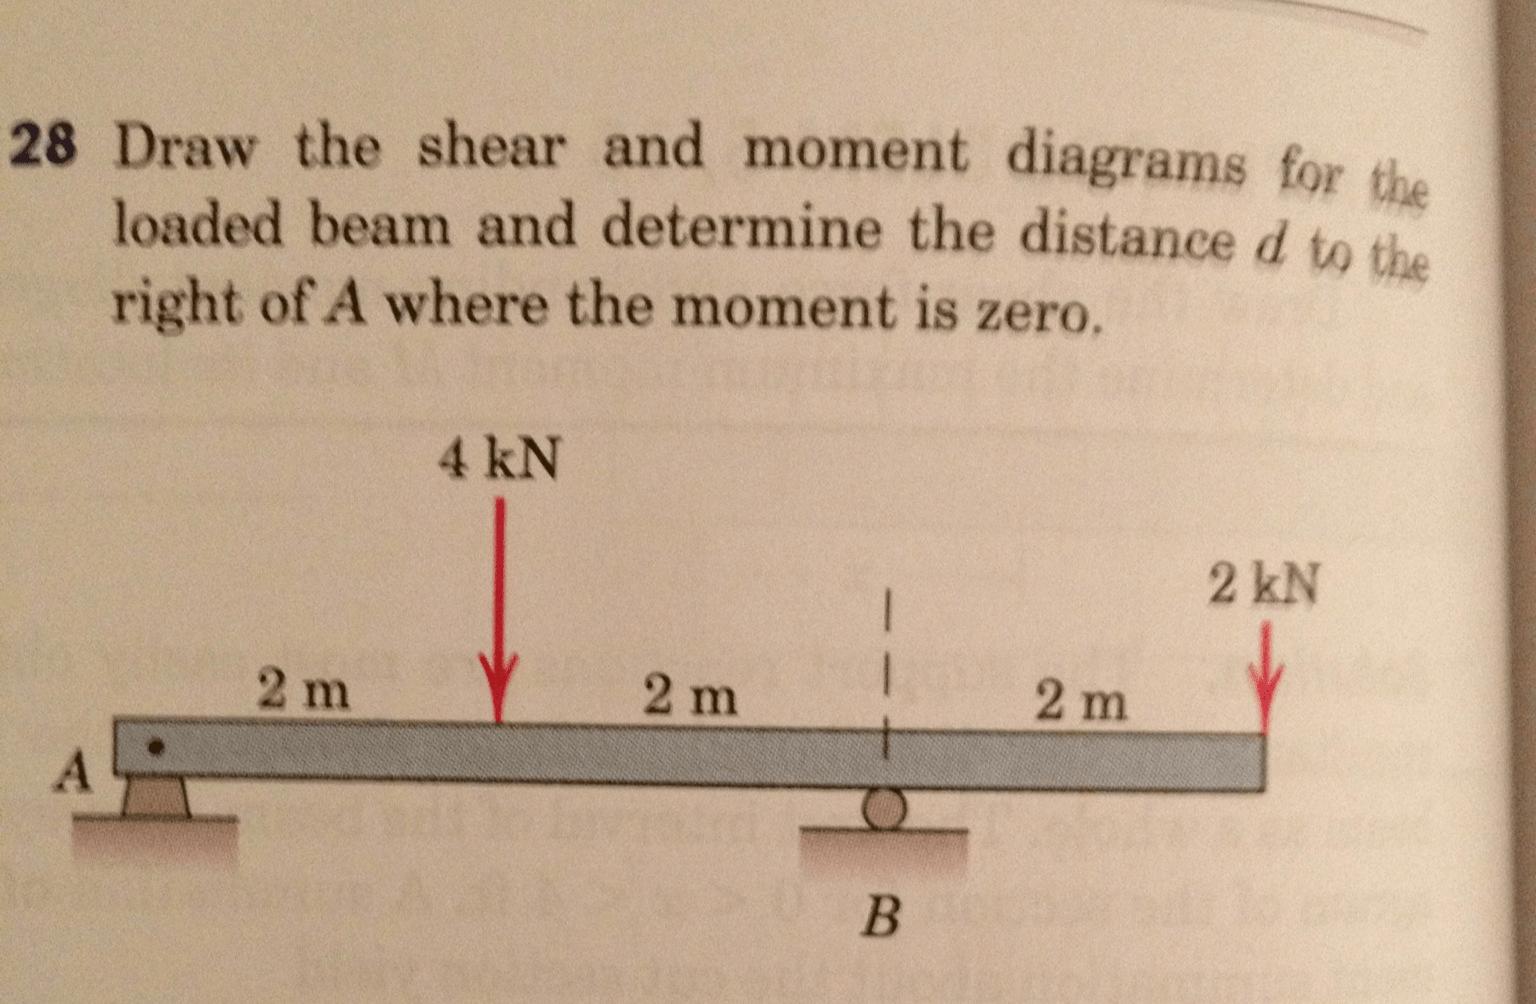 shear and moment diagram calculator nissan sentra wiring download free beam program software pachelper